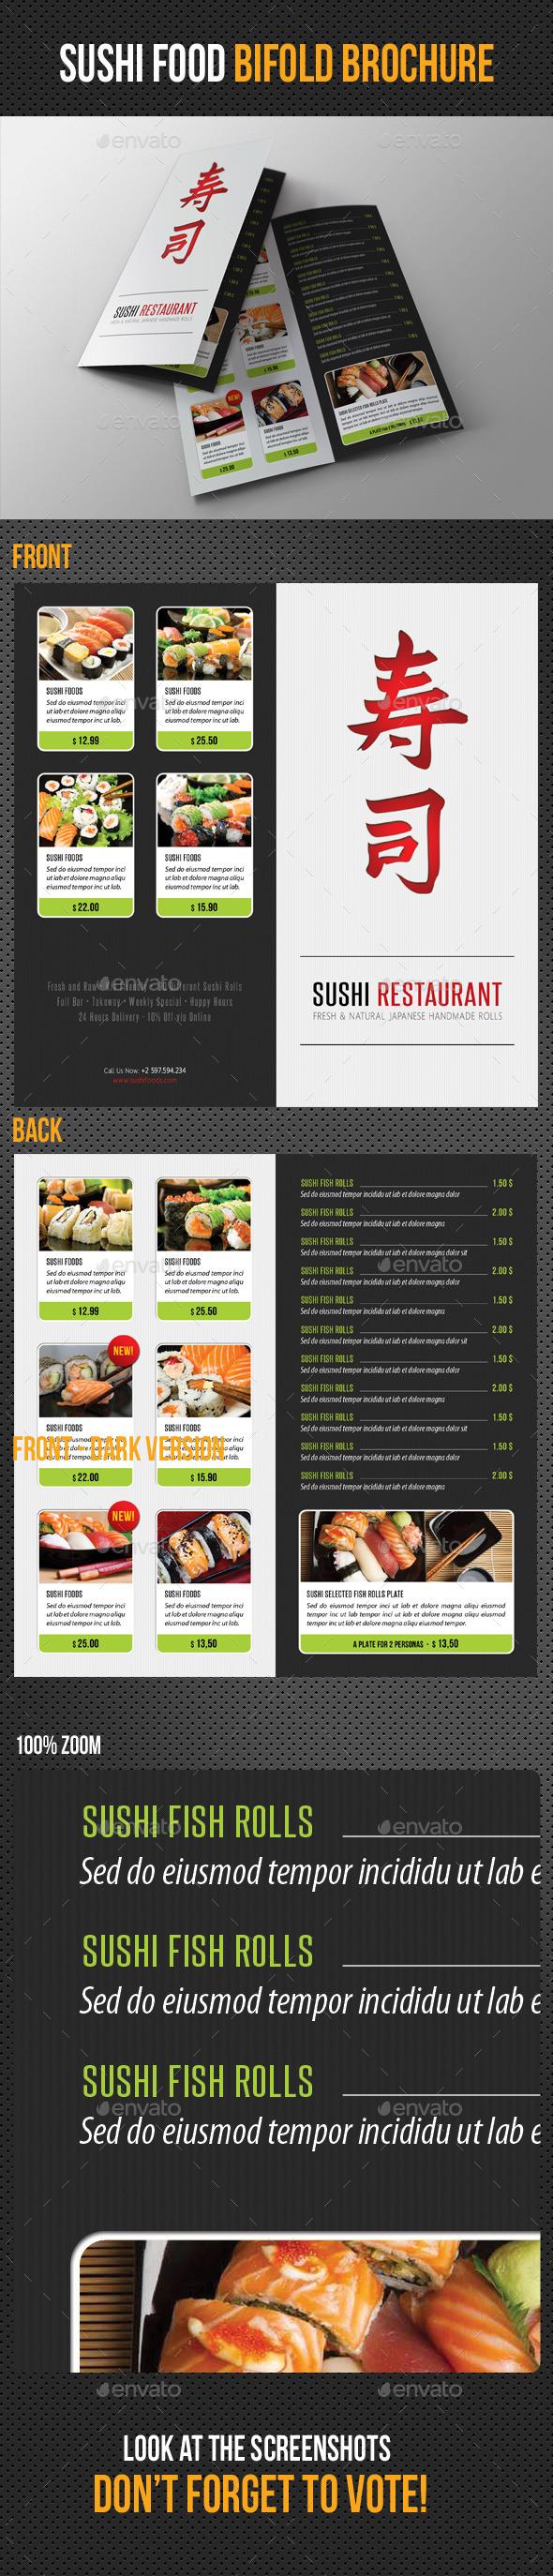 Sushi Restaurant Menu Bifold Brochure  Sushi Restaurants And